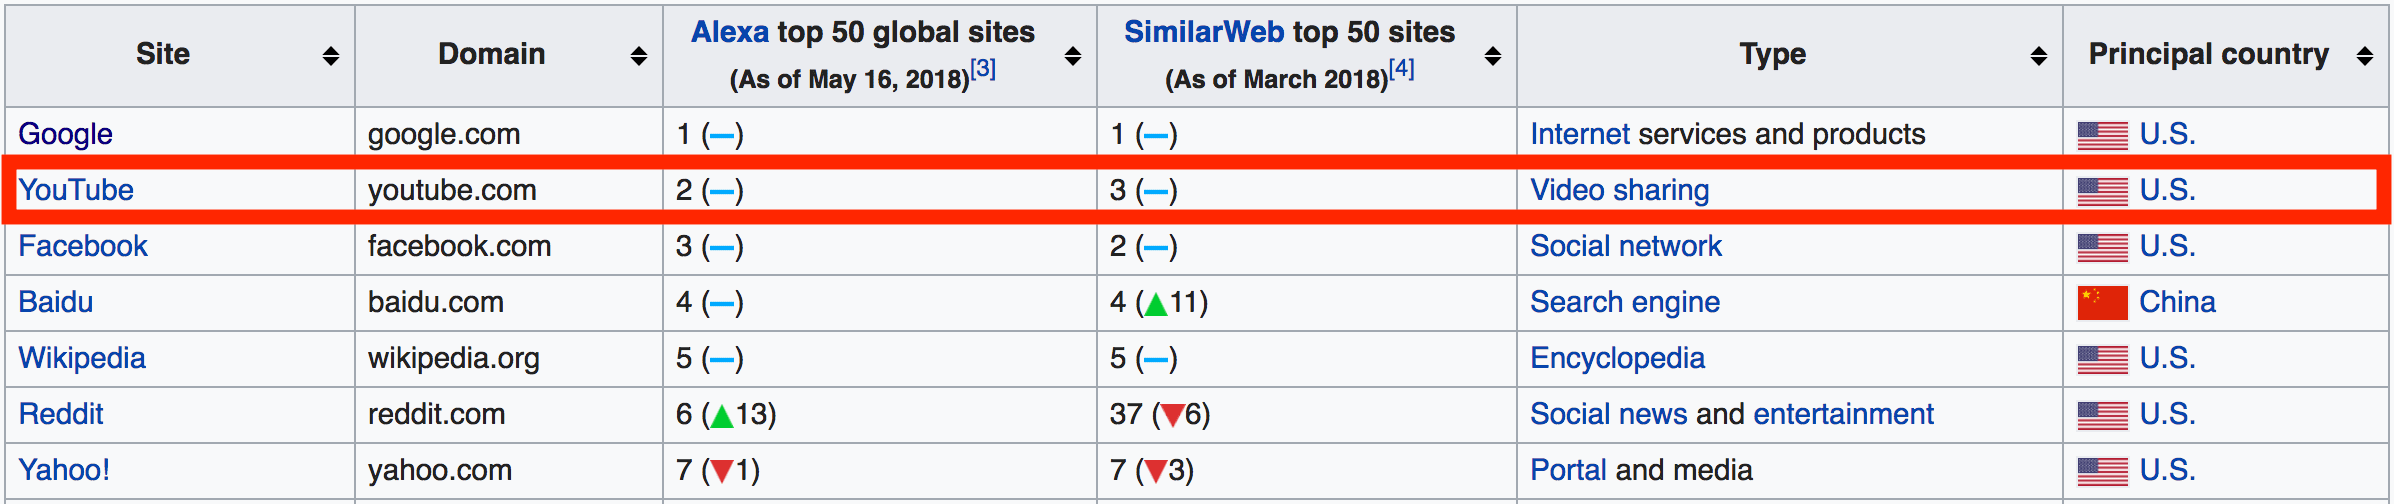 Most popular sites